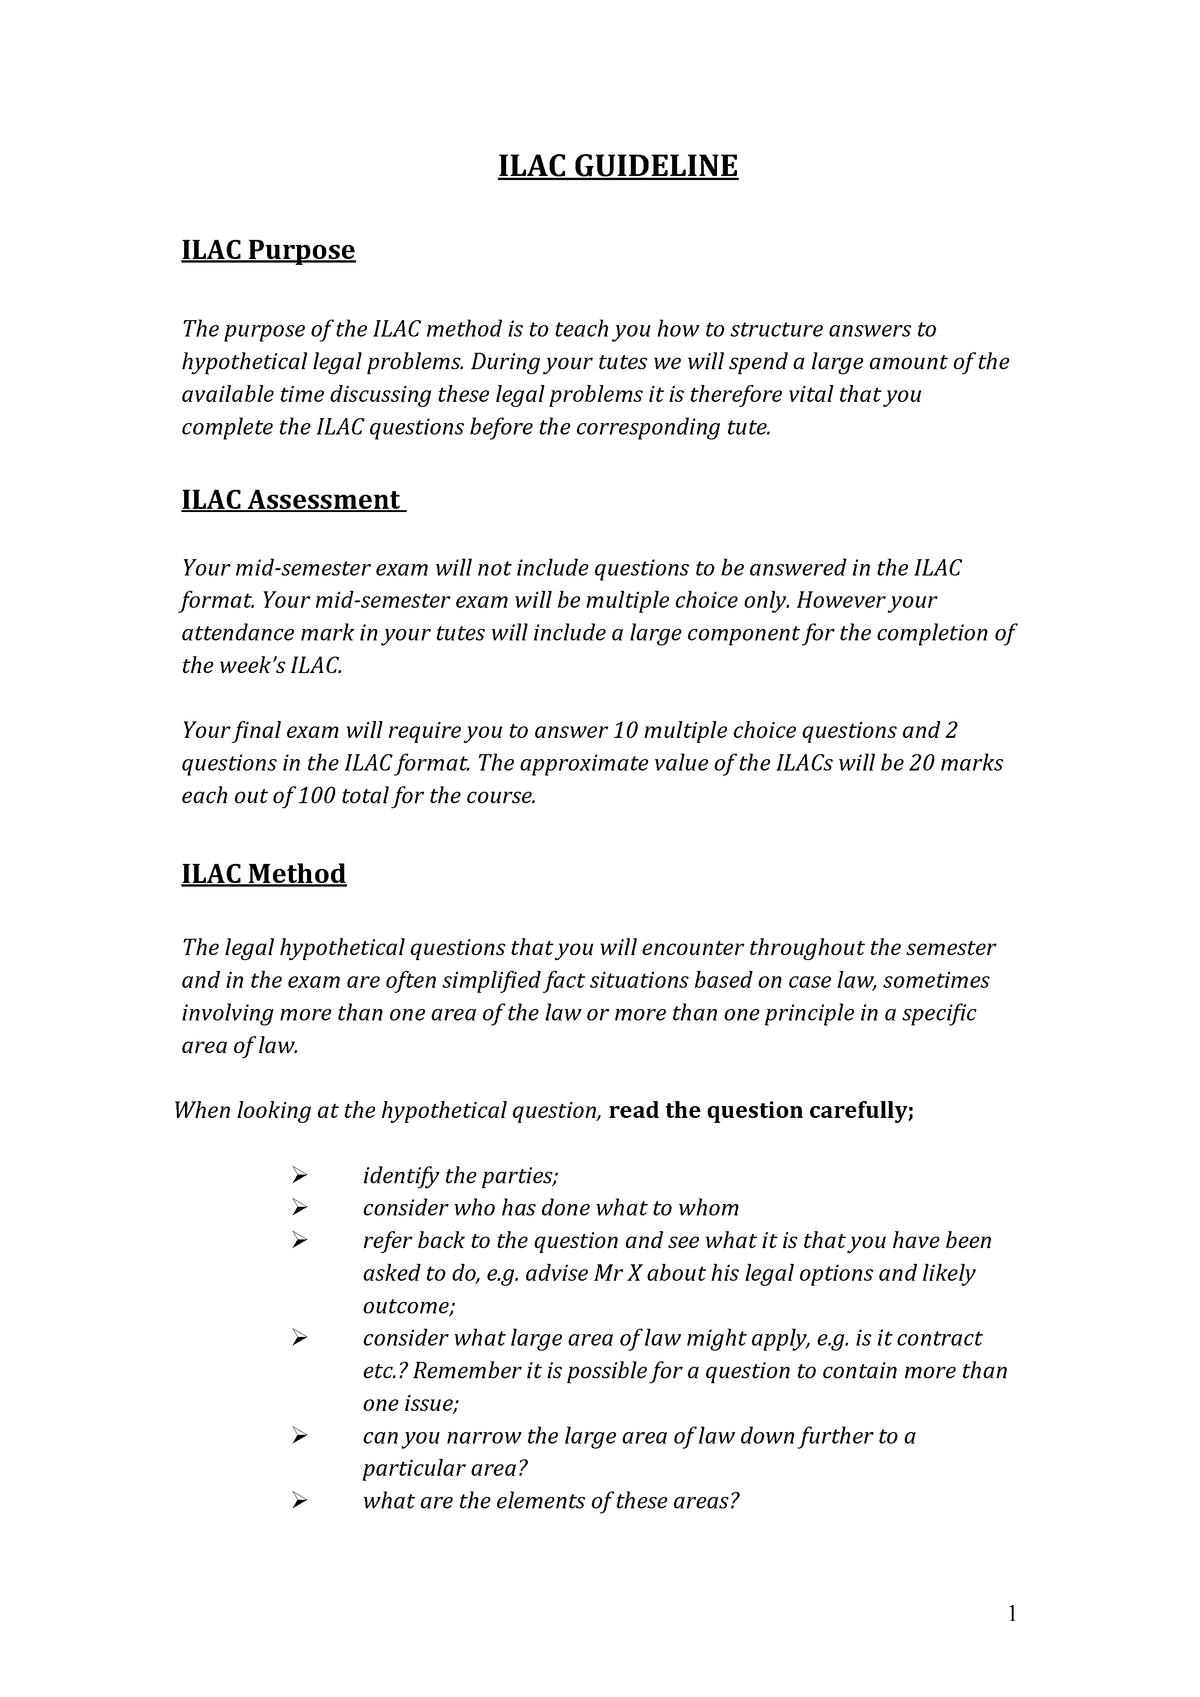 Practical - ILAC Guideline No 1 - 2007GIR - Griffith - StuDocu